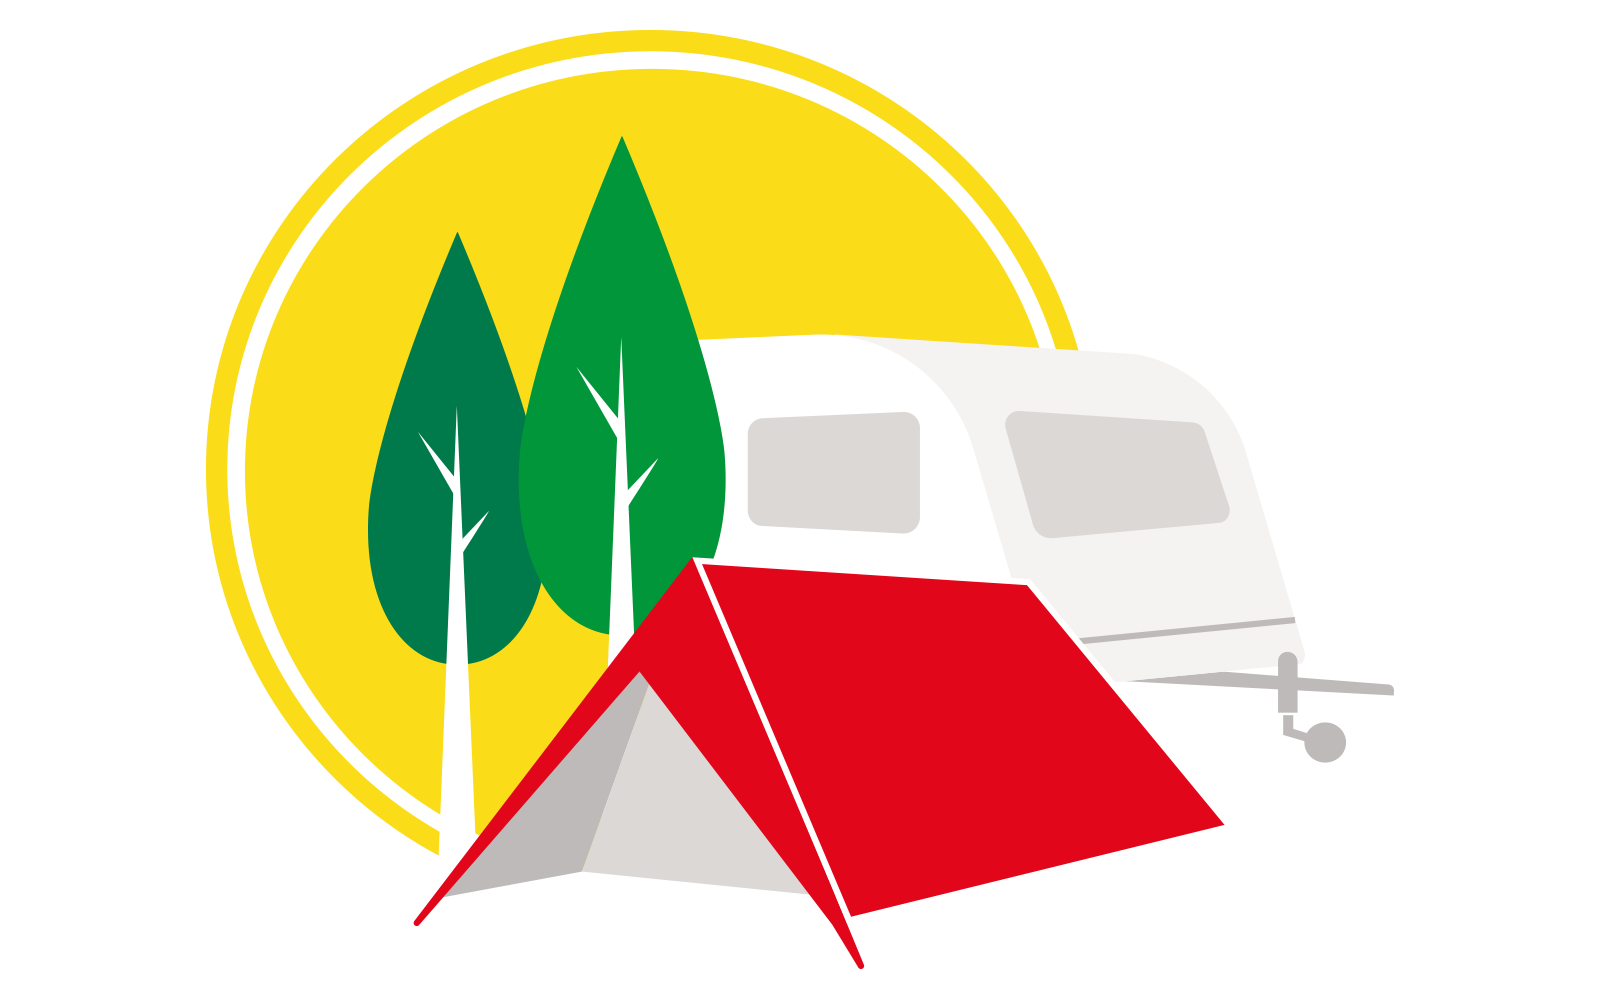 pf-logo-kampeer